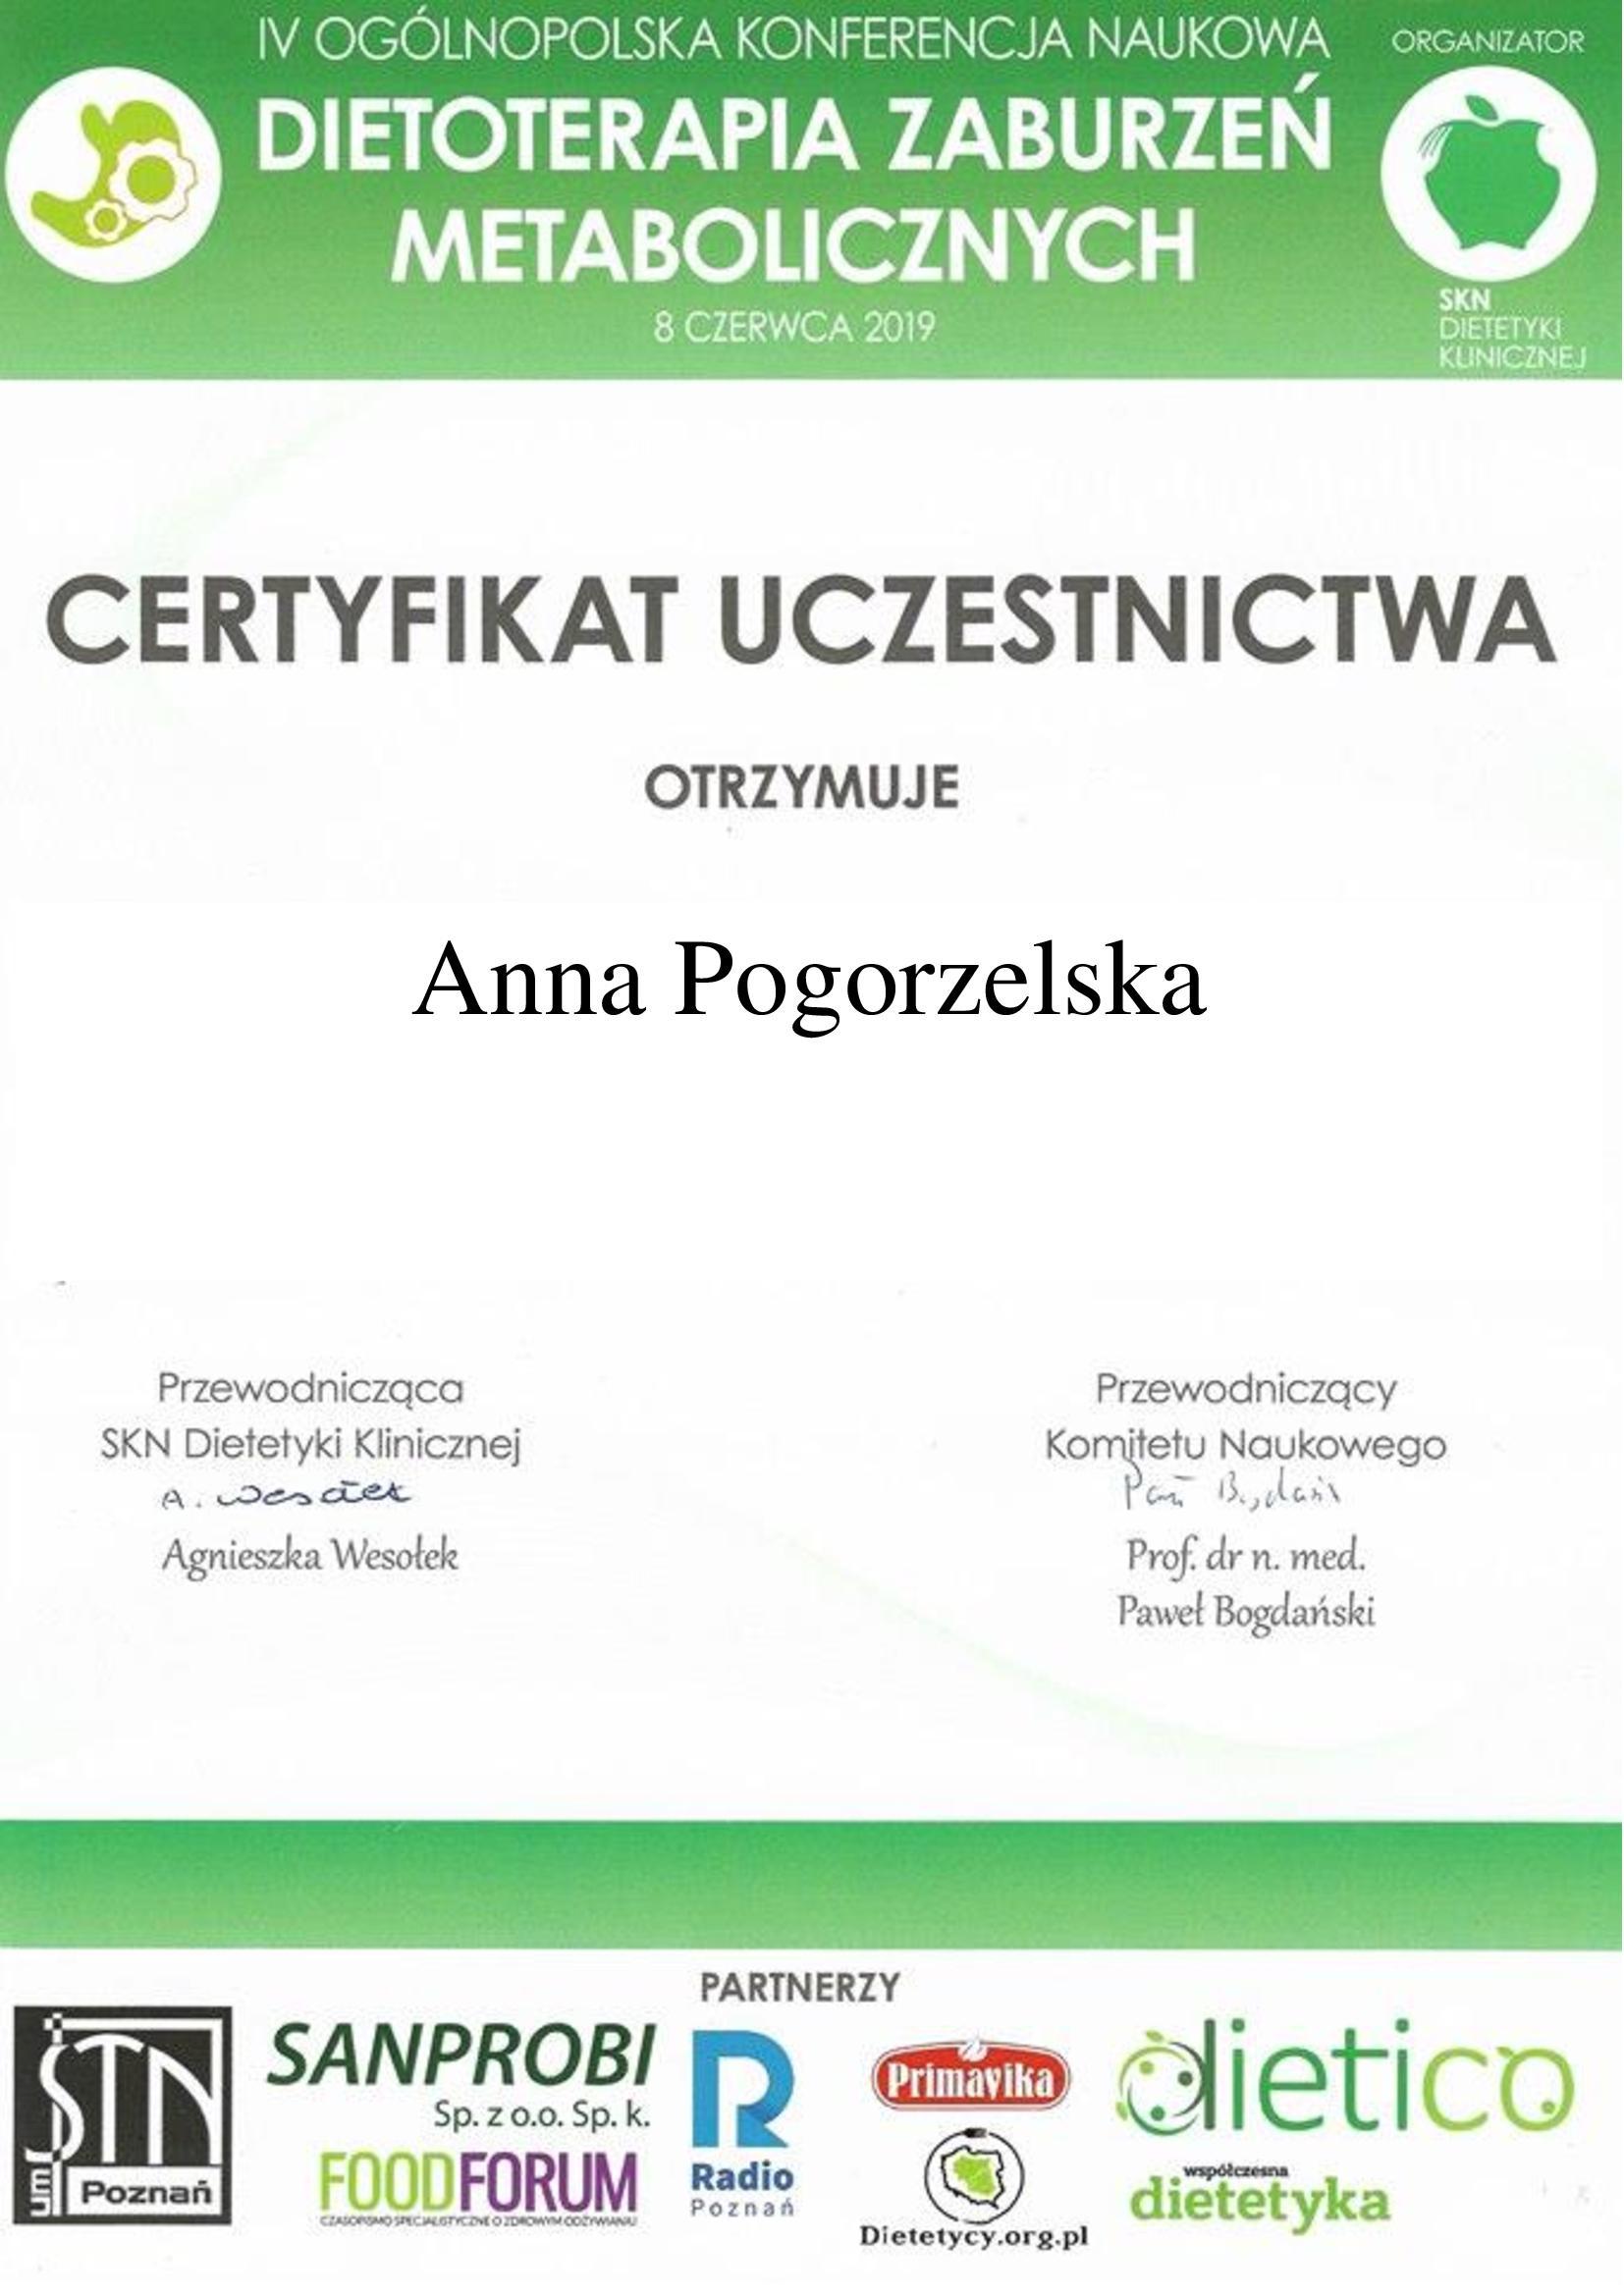 dietetyk Środa Wlkp. Anna Pogorzelska